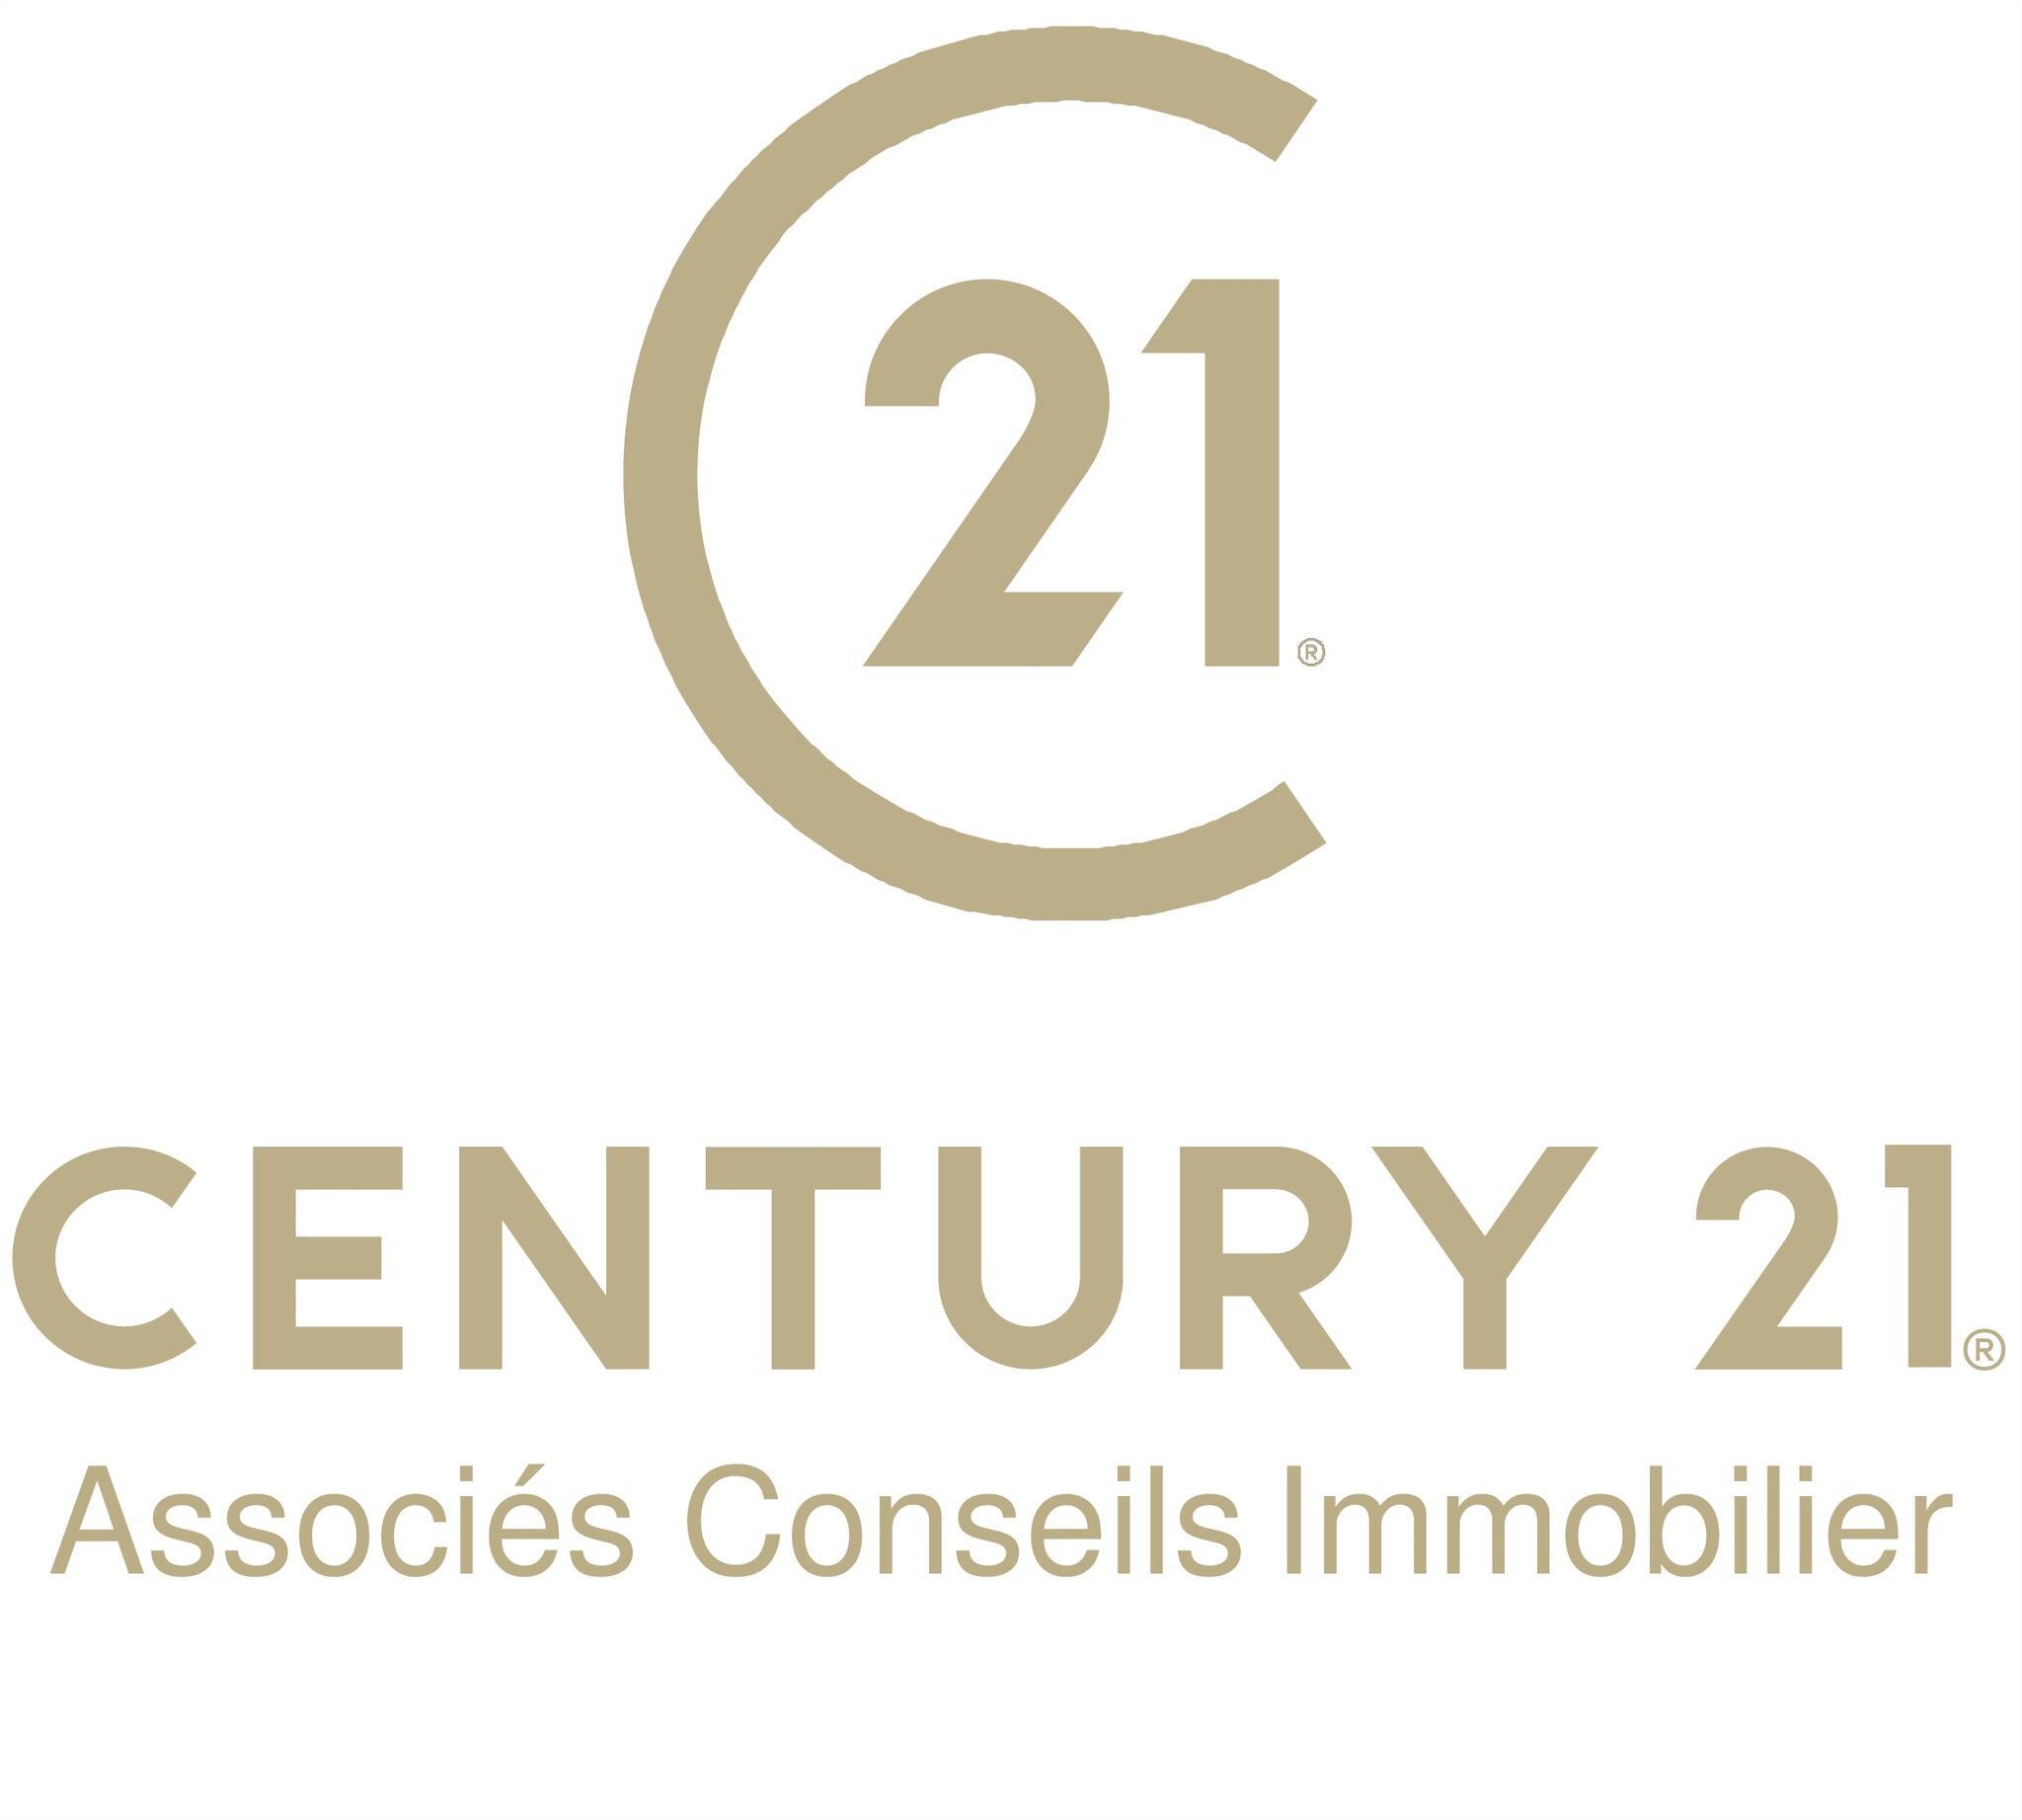 century-21-associes-conseils-immobilier-4564_cli_logo